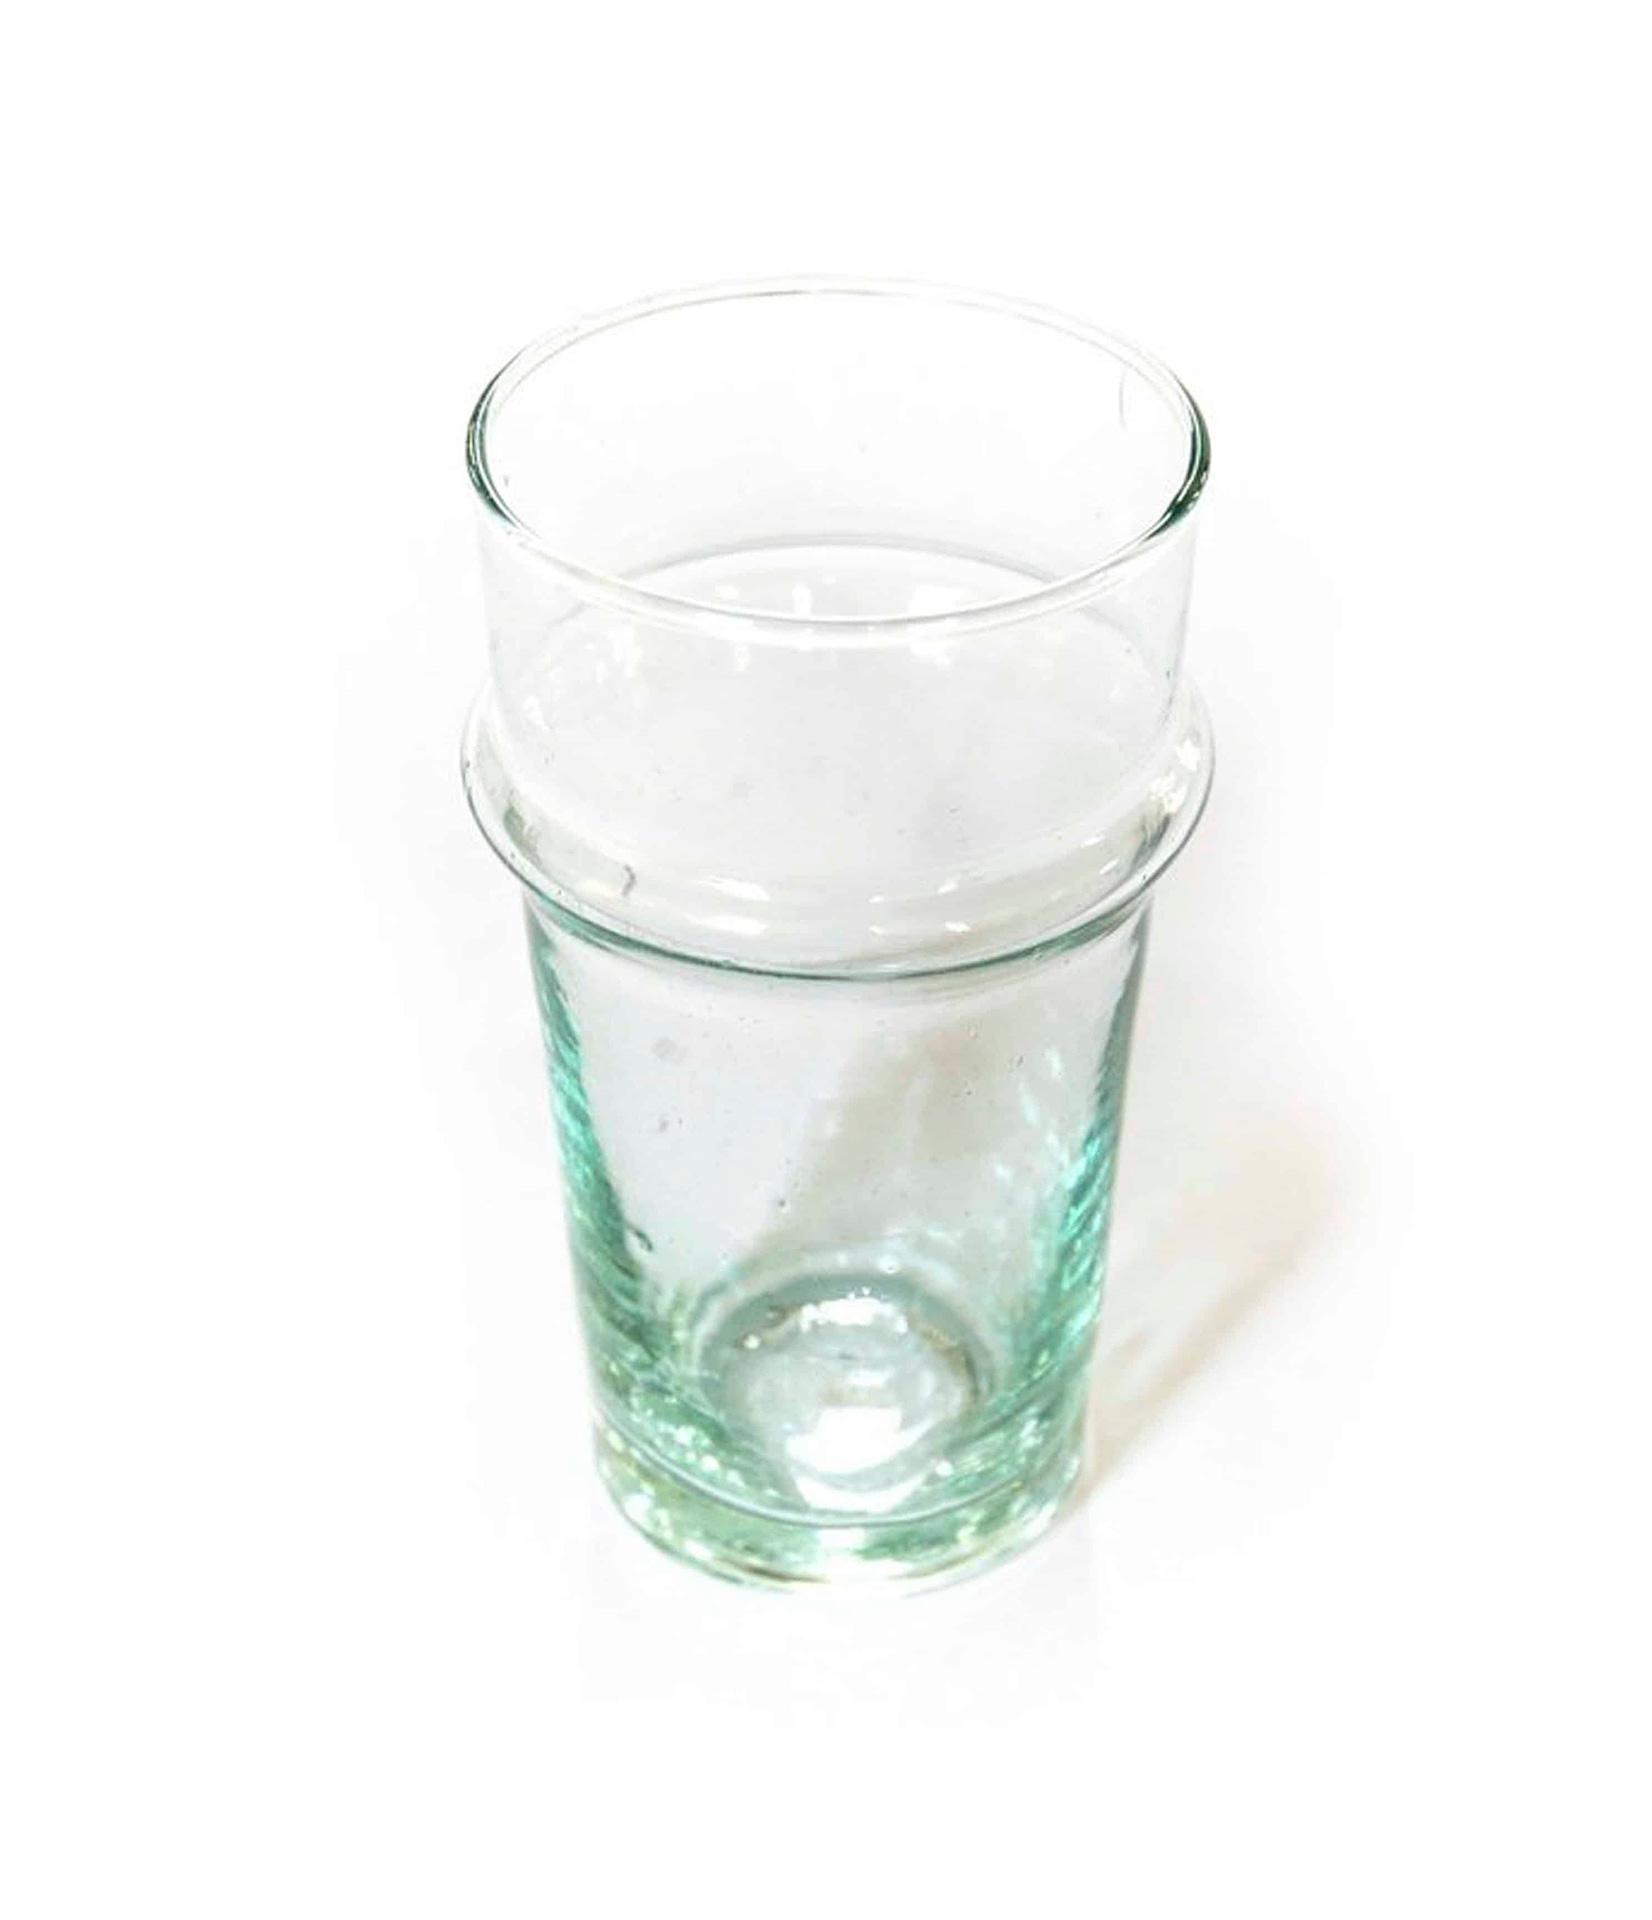 beldi glass above